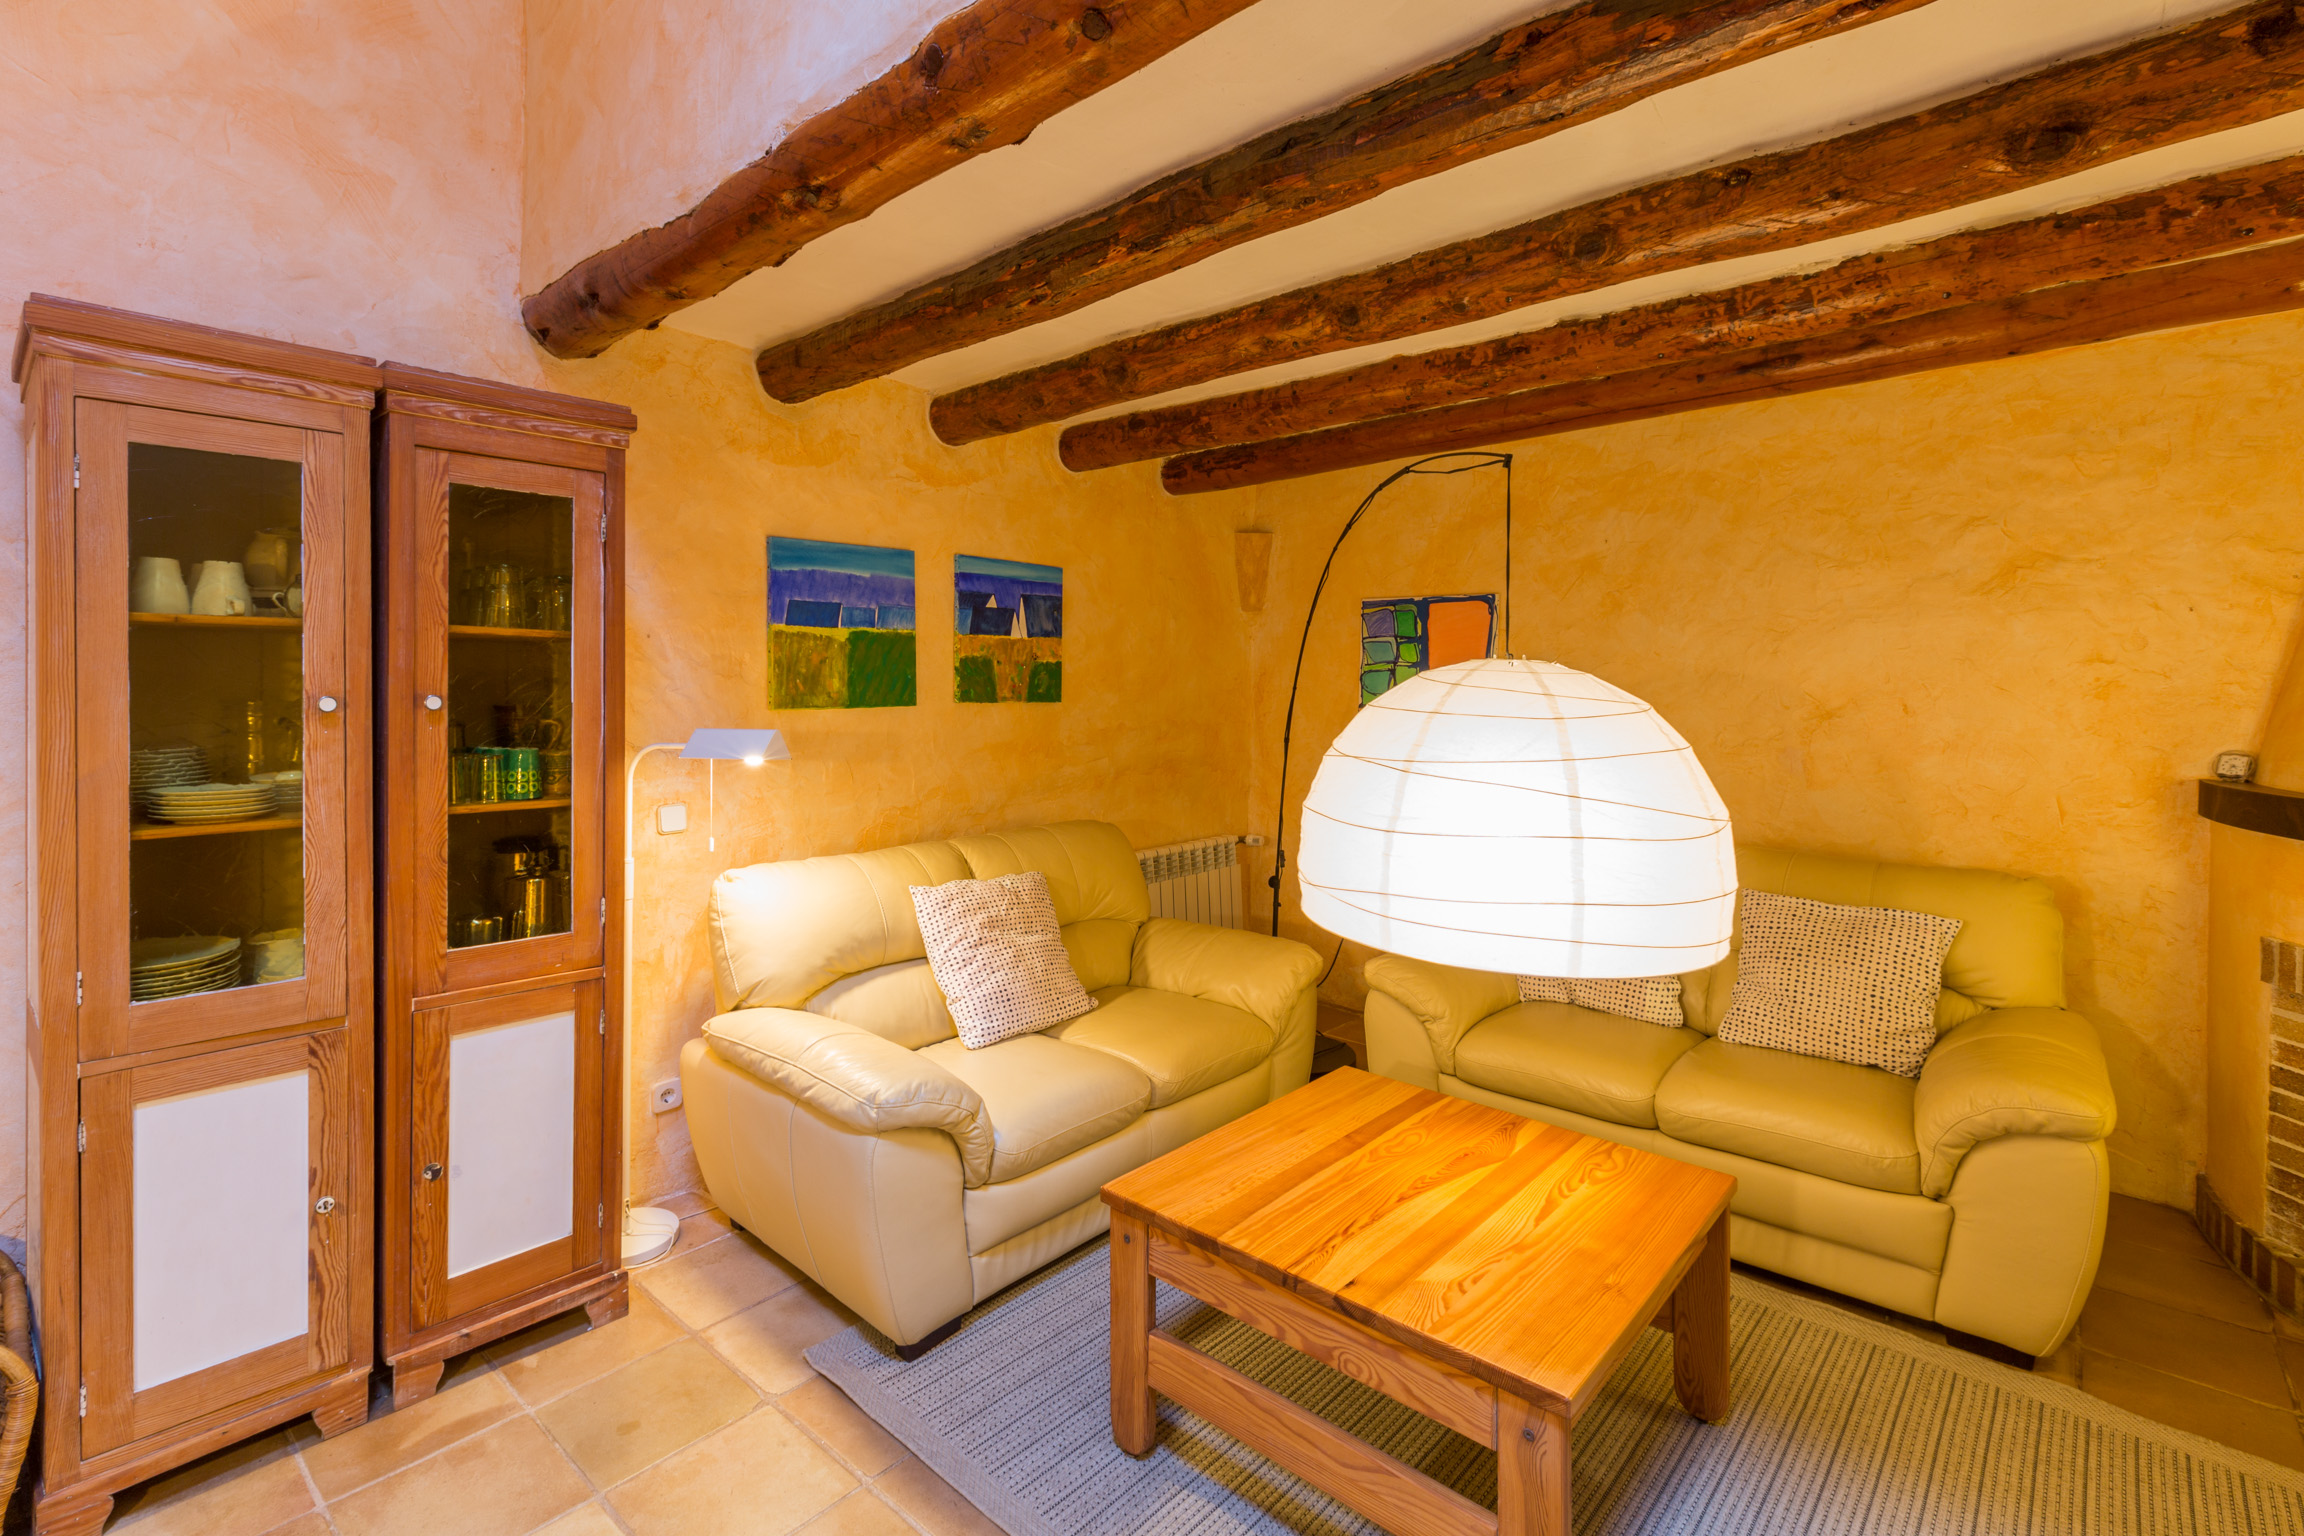 Ferienhaus GORET VELL (1856980), Santanyi, Mallorca, Balearische Inseln, Spanien, Bild 11